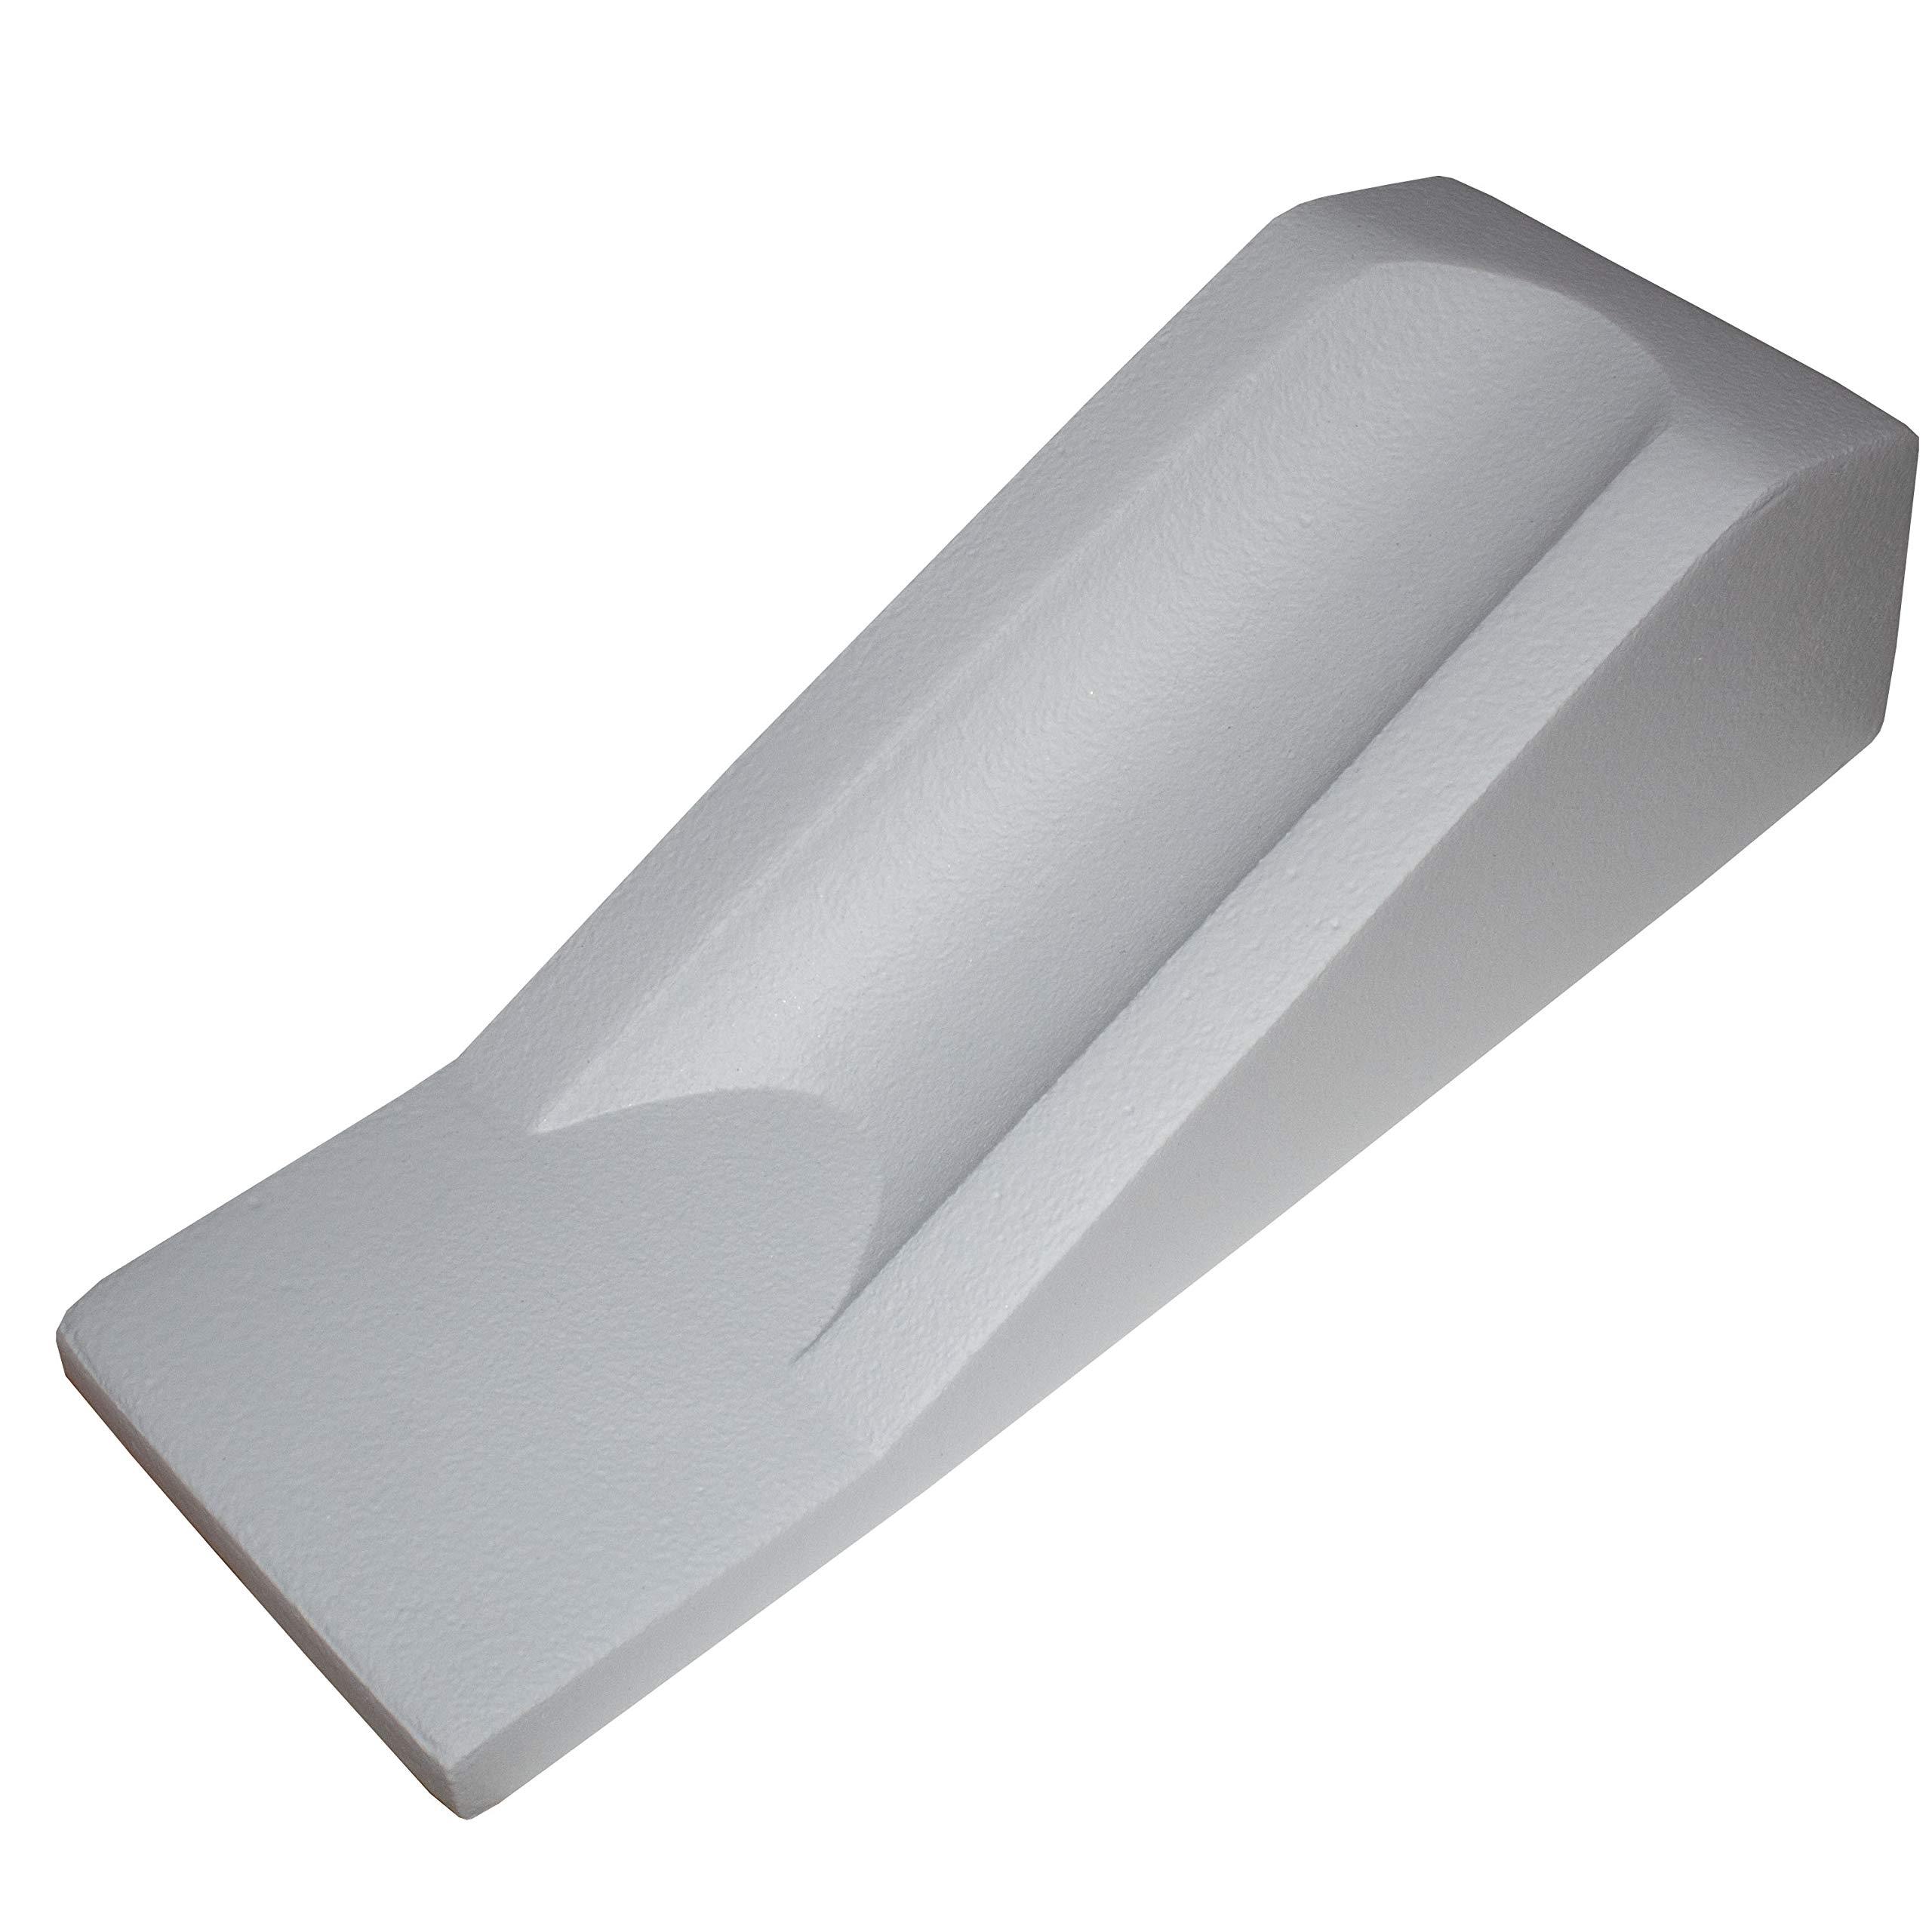 Rehabilitation Advantage Gray Coated Arm Support Foam Arm Rest